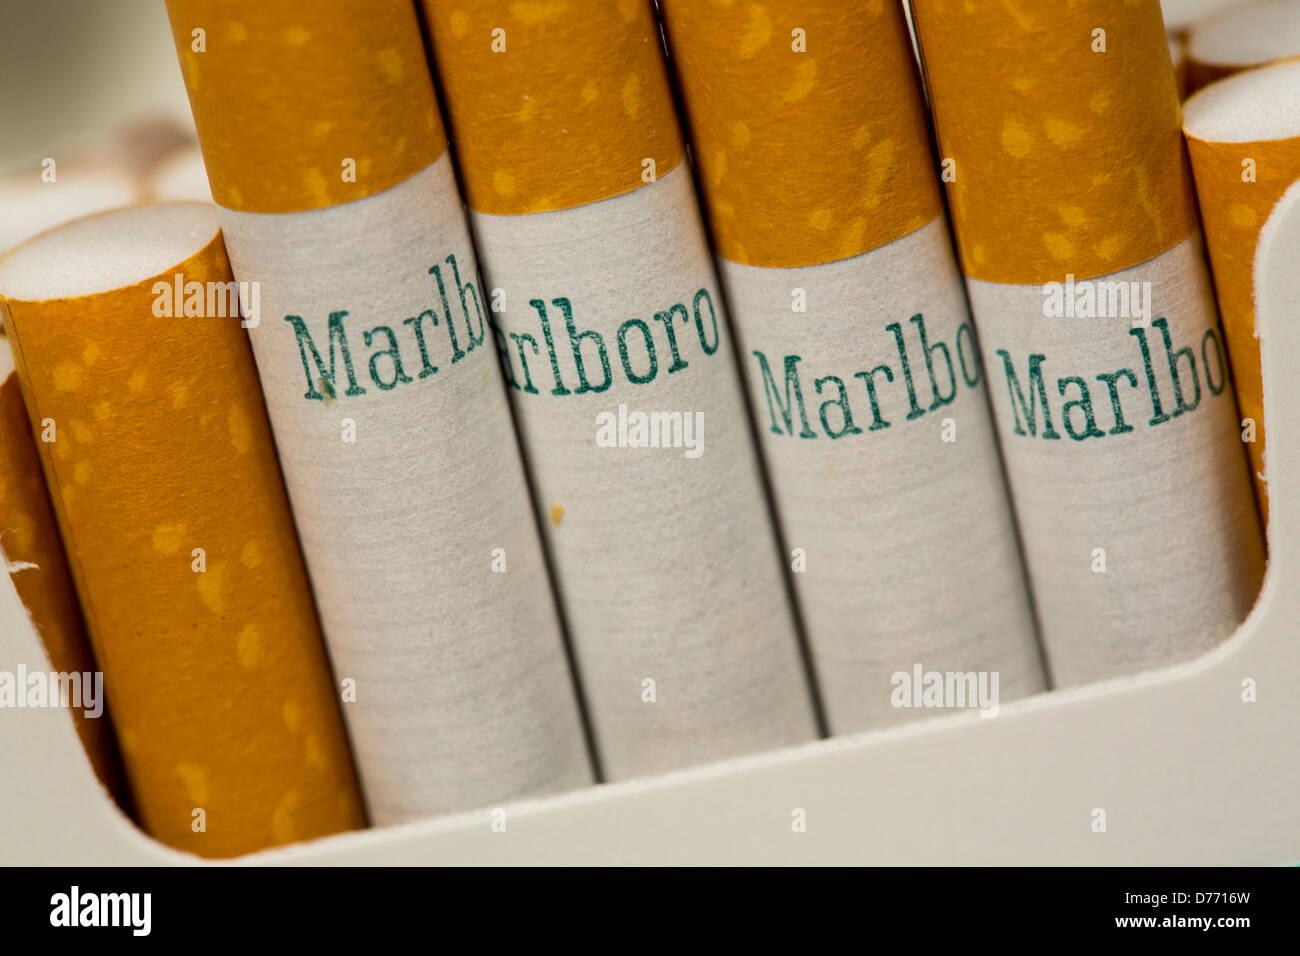 How to buy cigarettes Marlboro online in Houston